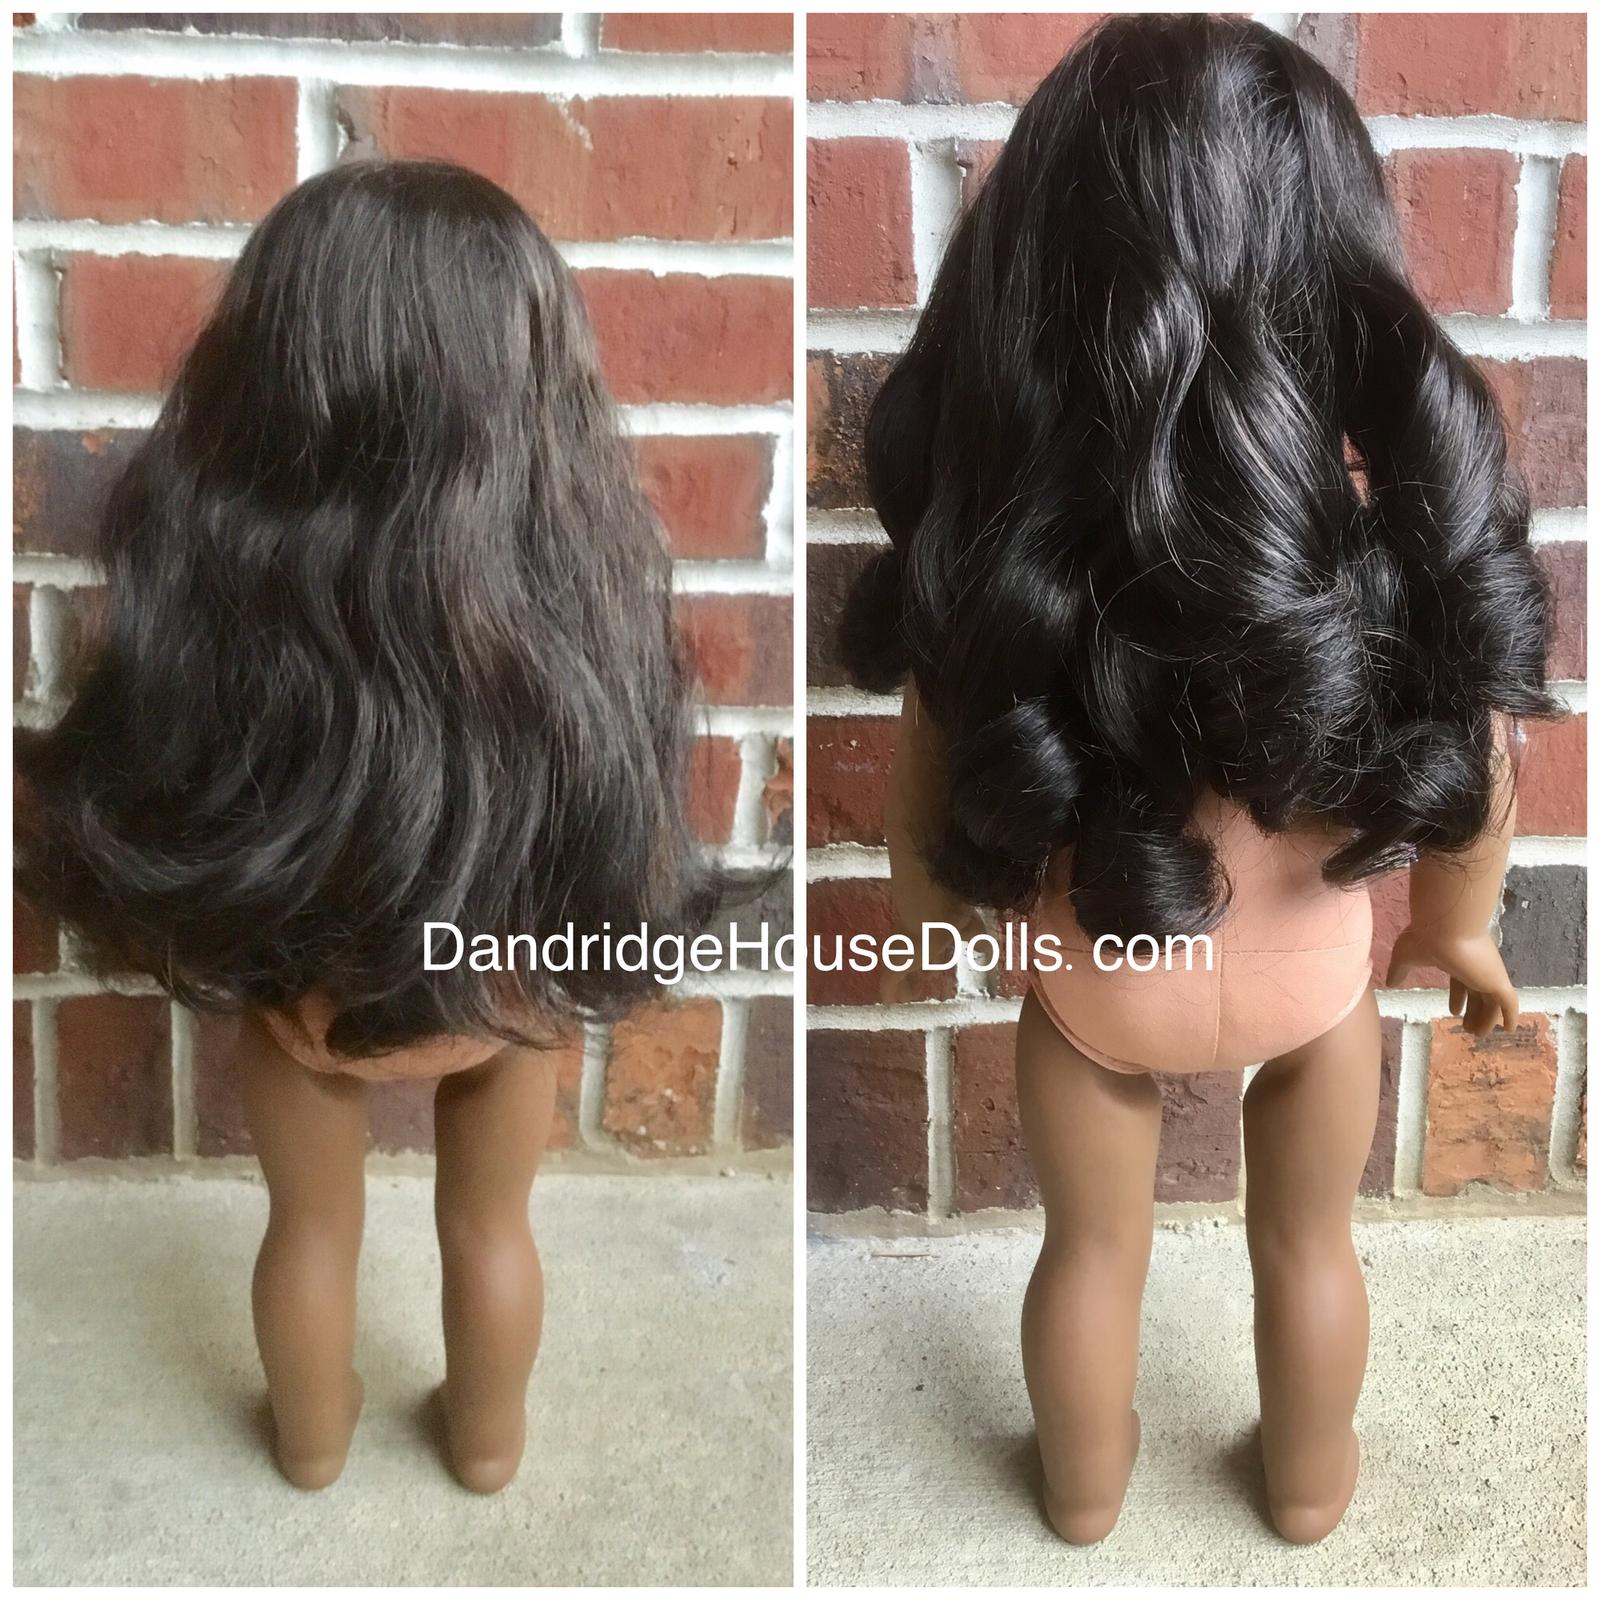 Restoring Doll Hair Tutorial Dandridge House Dolls